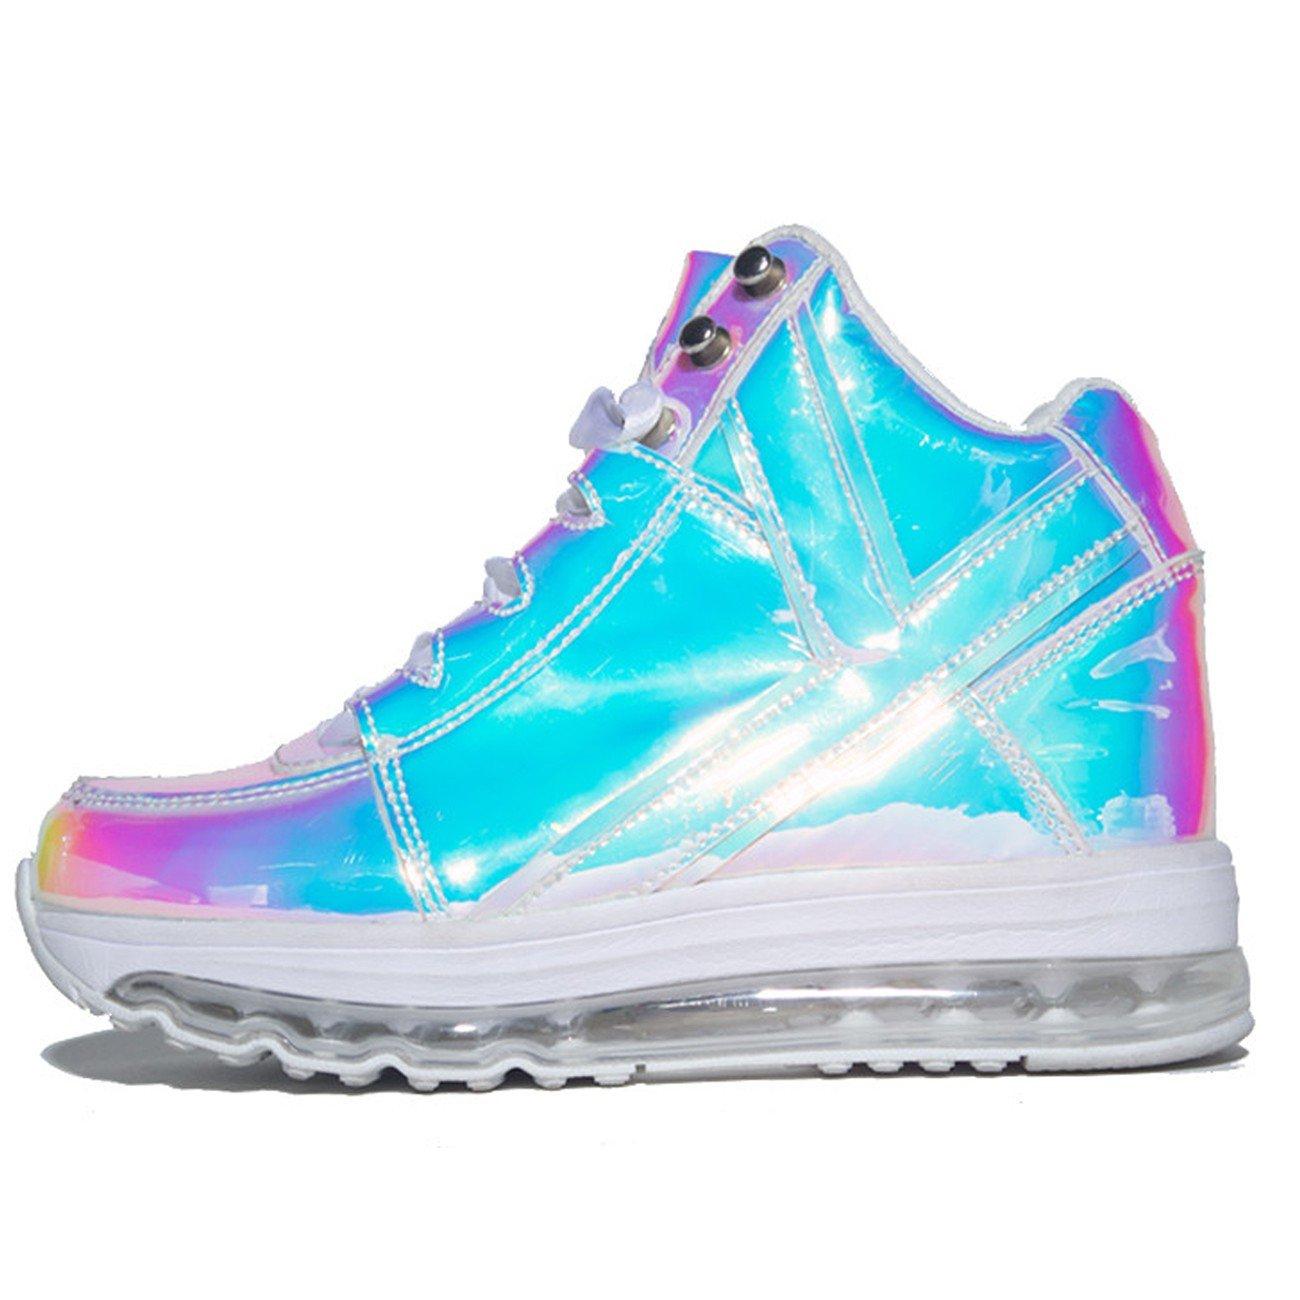 d049bda7e Amazon.com | YRU Aiire Atlantis, Hologram high top Sneaker | Fashion  Sneakers